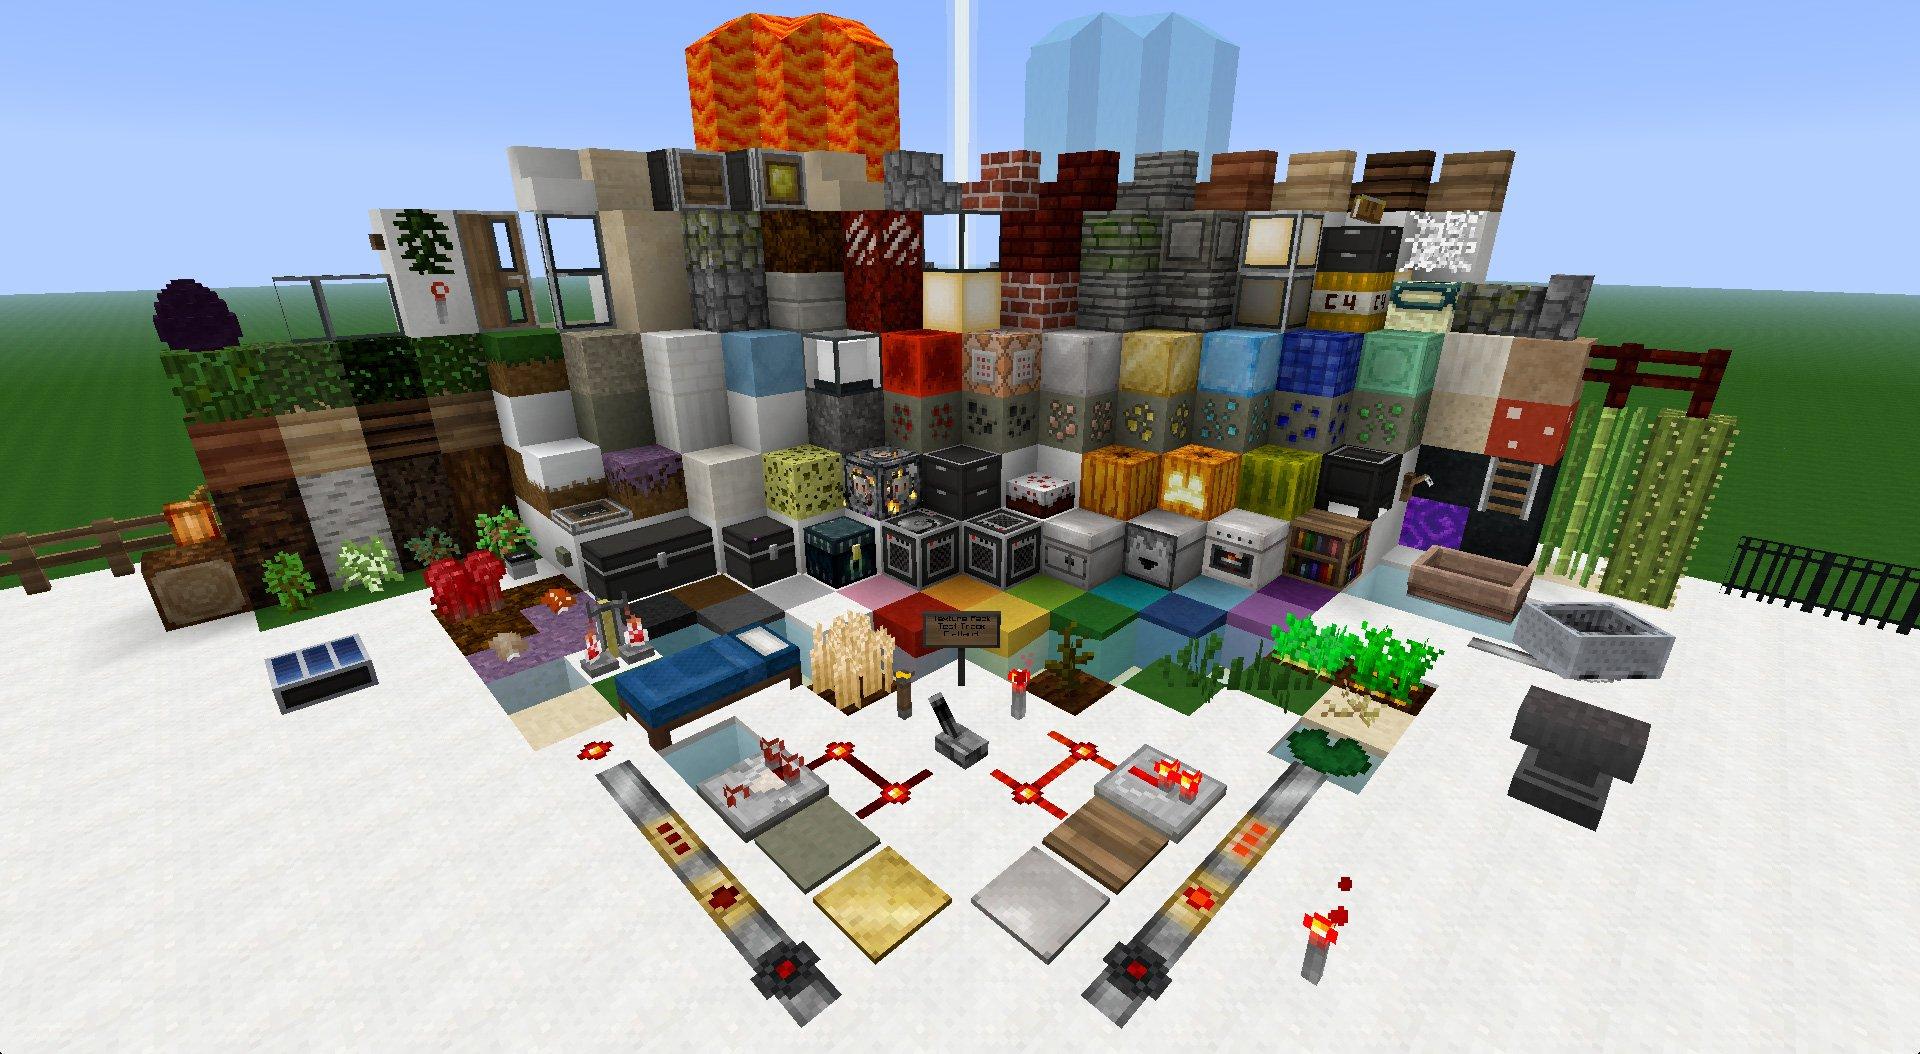 Pamplemousse Minecraft Texture Packs